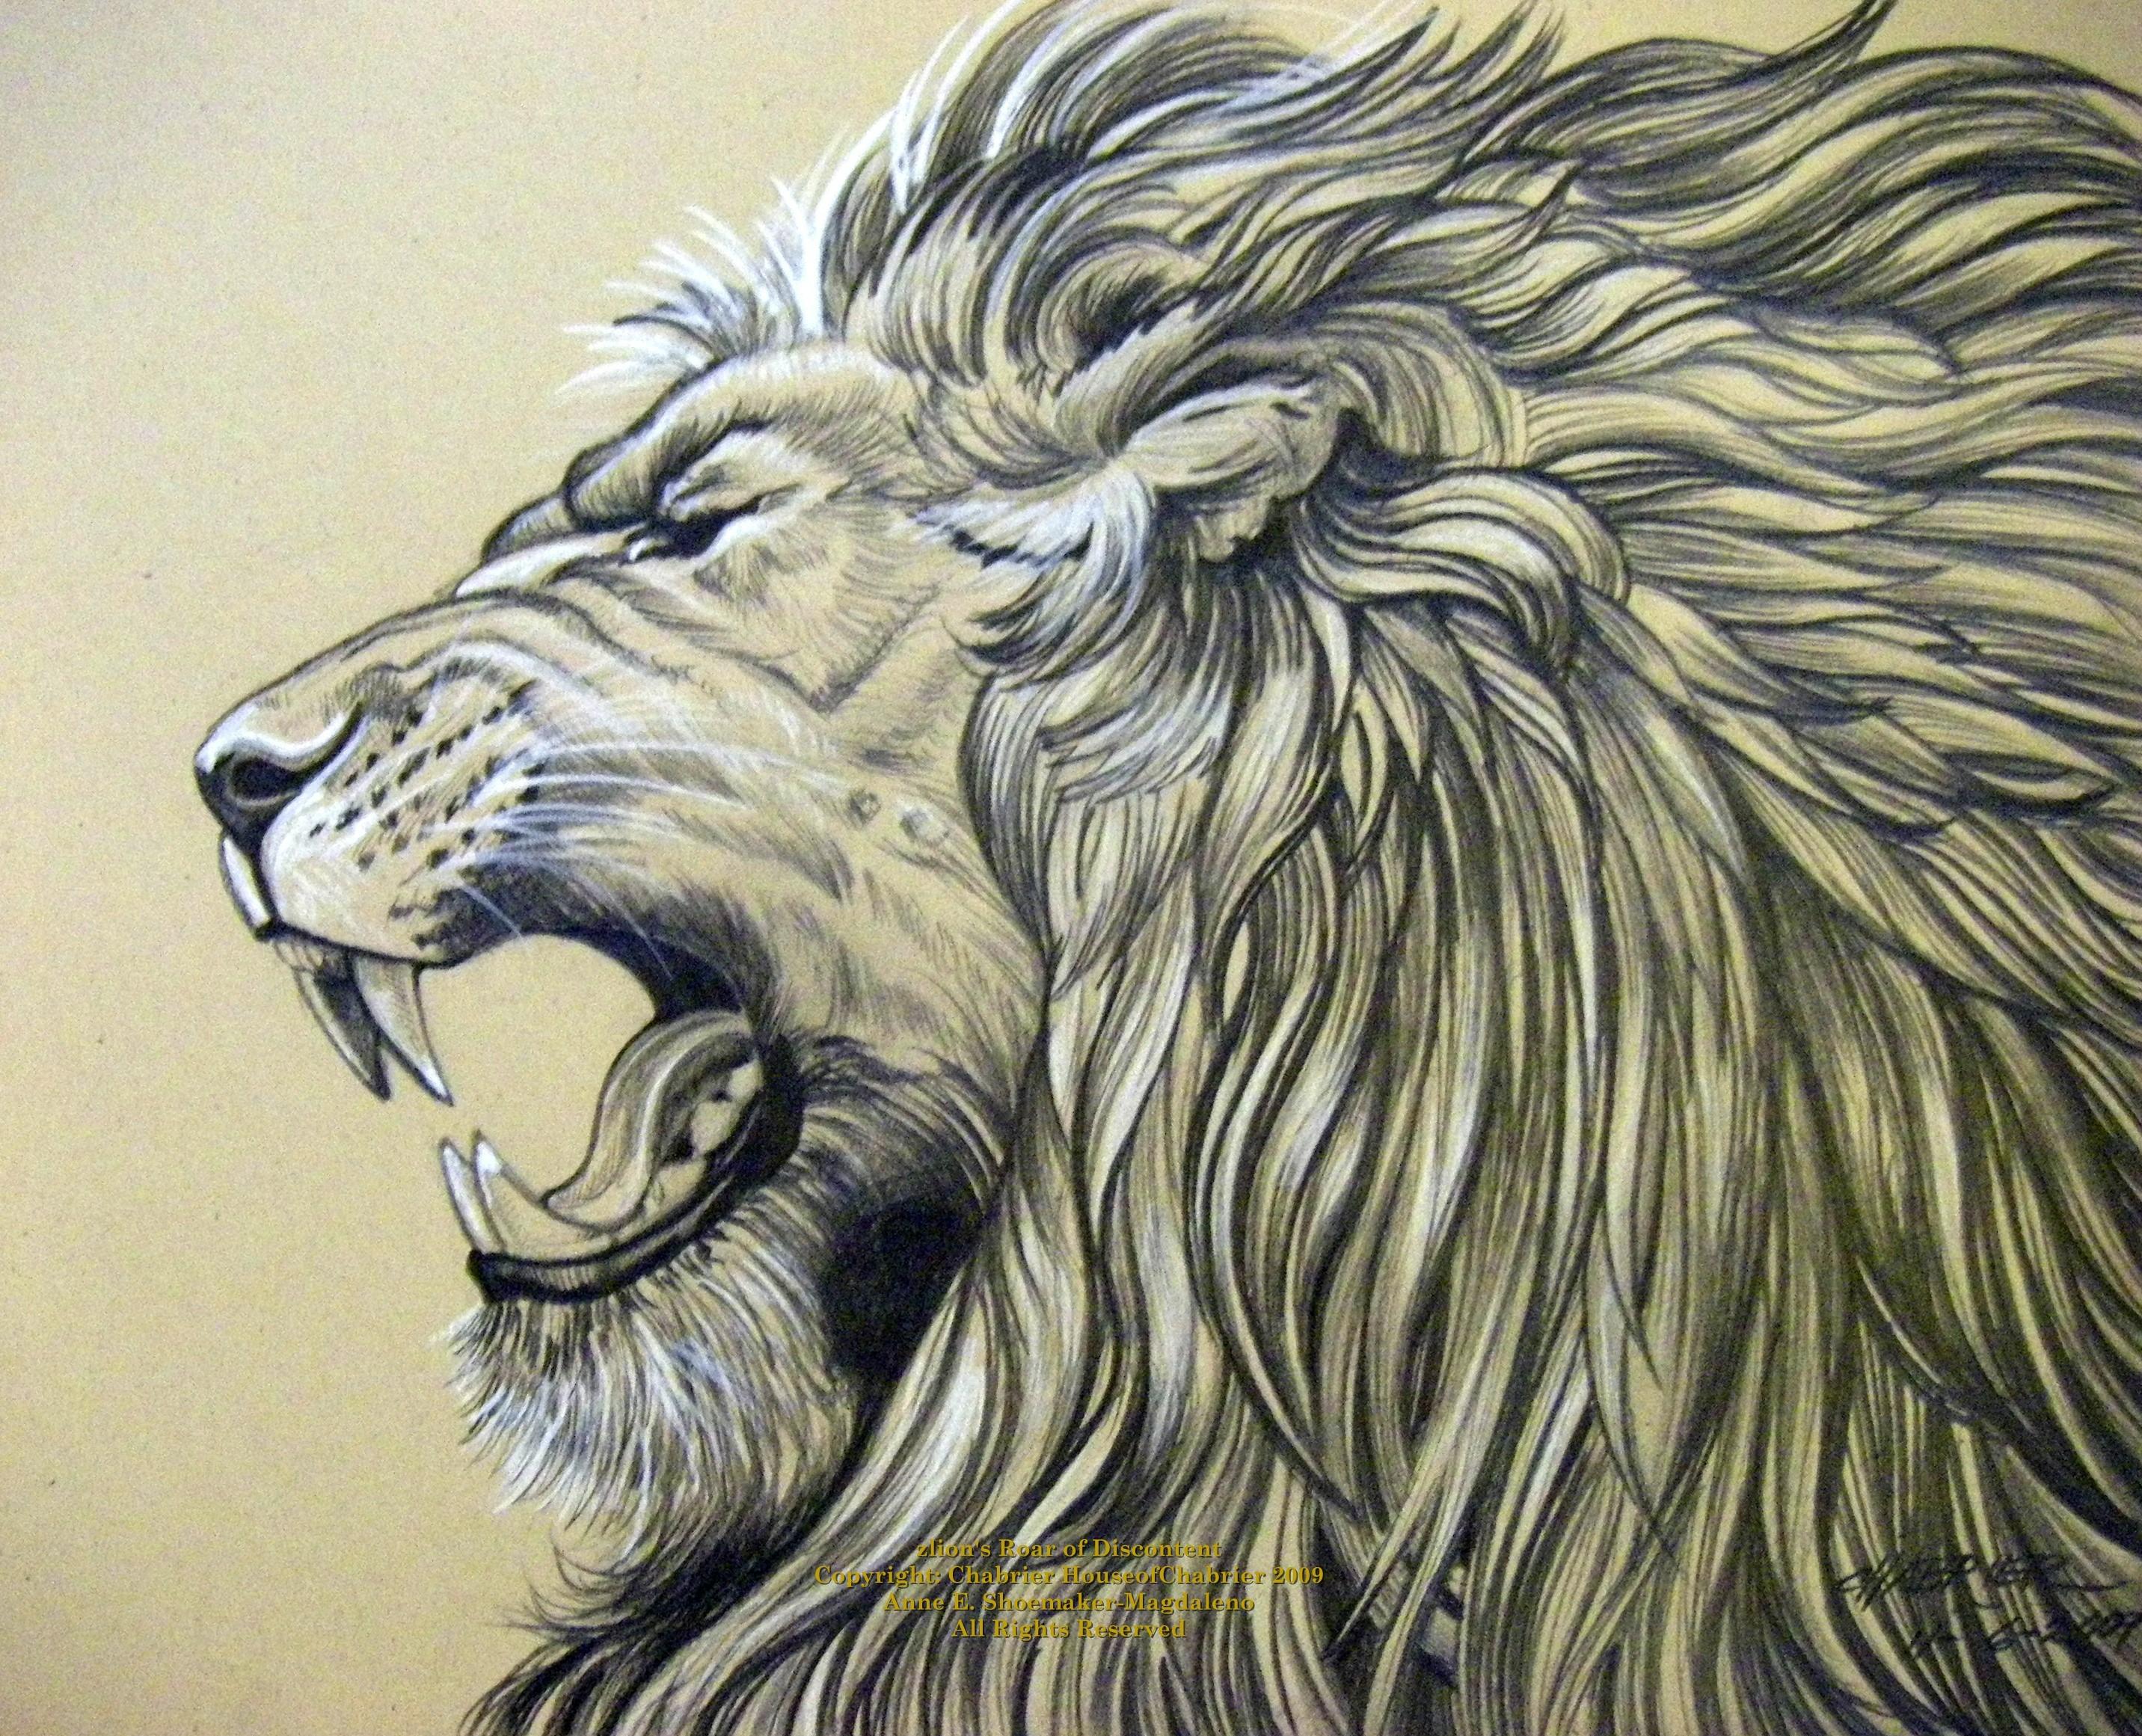 2864x2321 Pencil Sketches Of Lion Drawn Sketch Lion Roaring